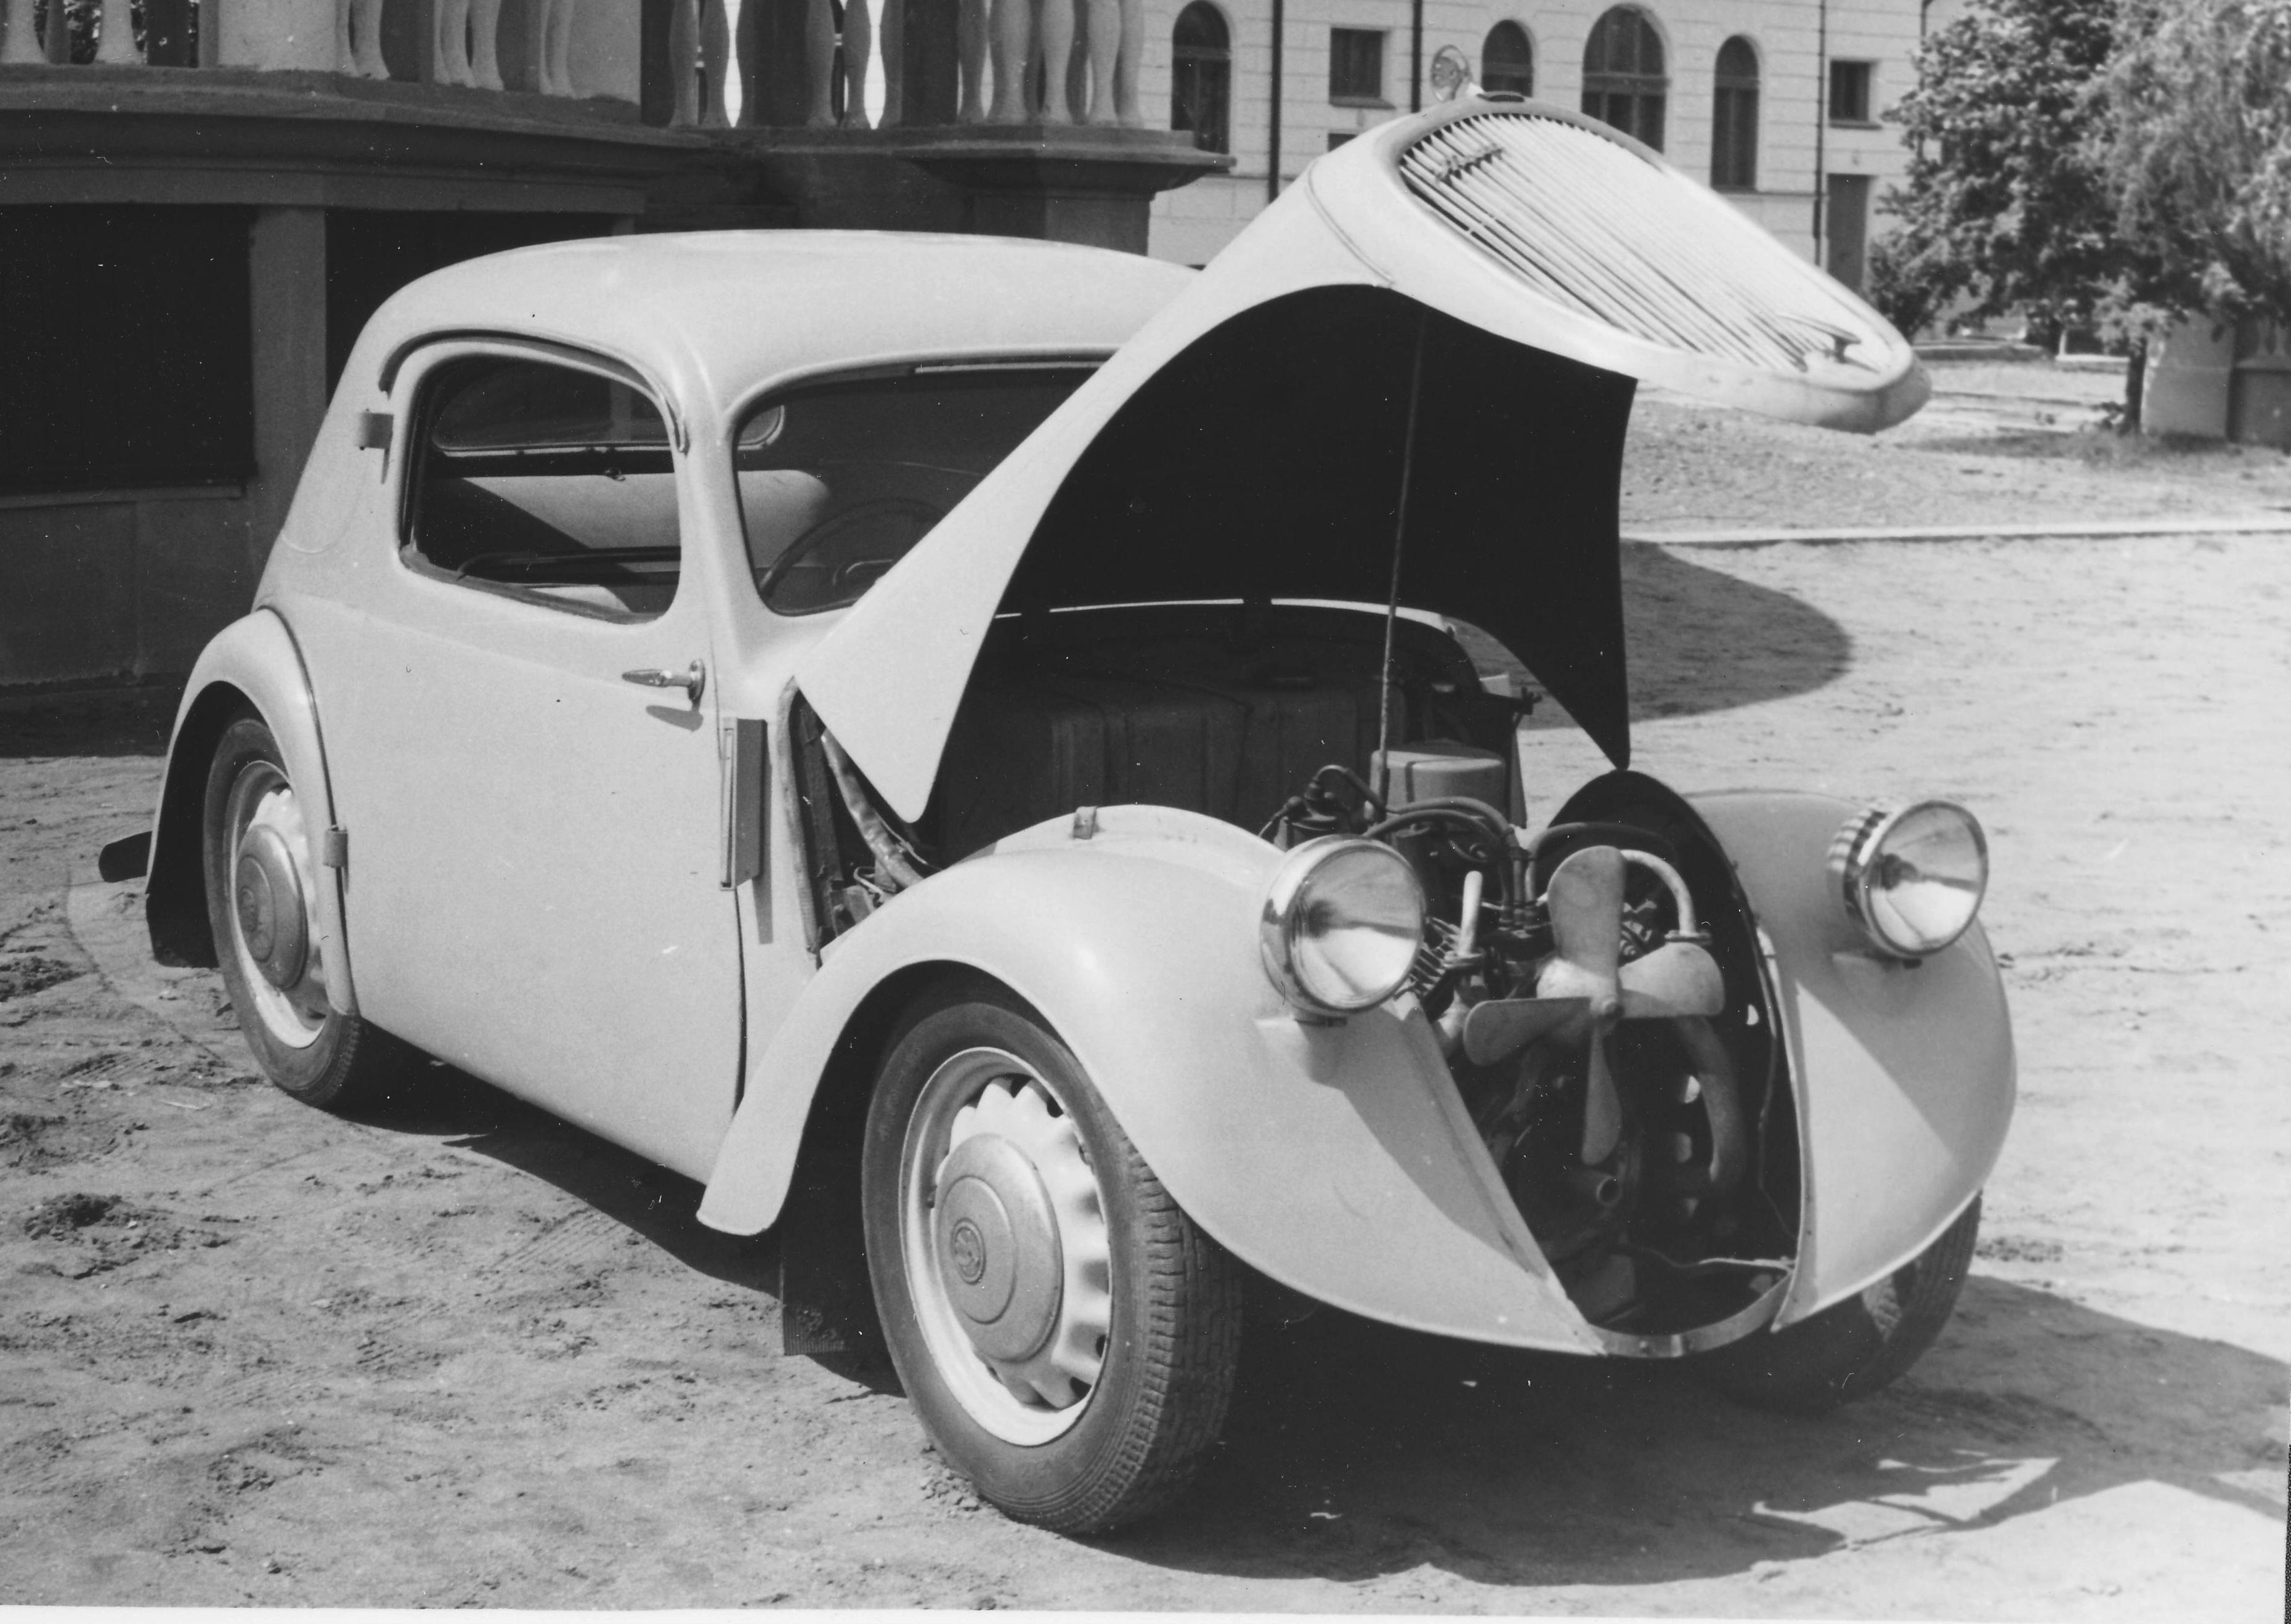 Lesser-known models from SKODA AUTO's 125-year history: The SKODA SAGITTA - Image 3